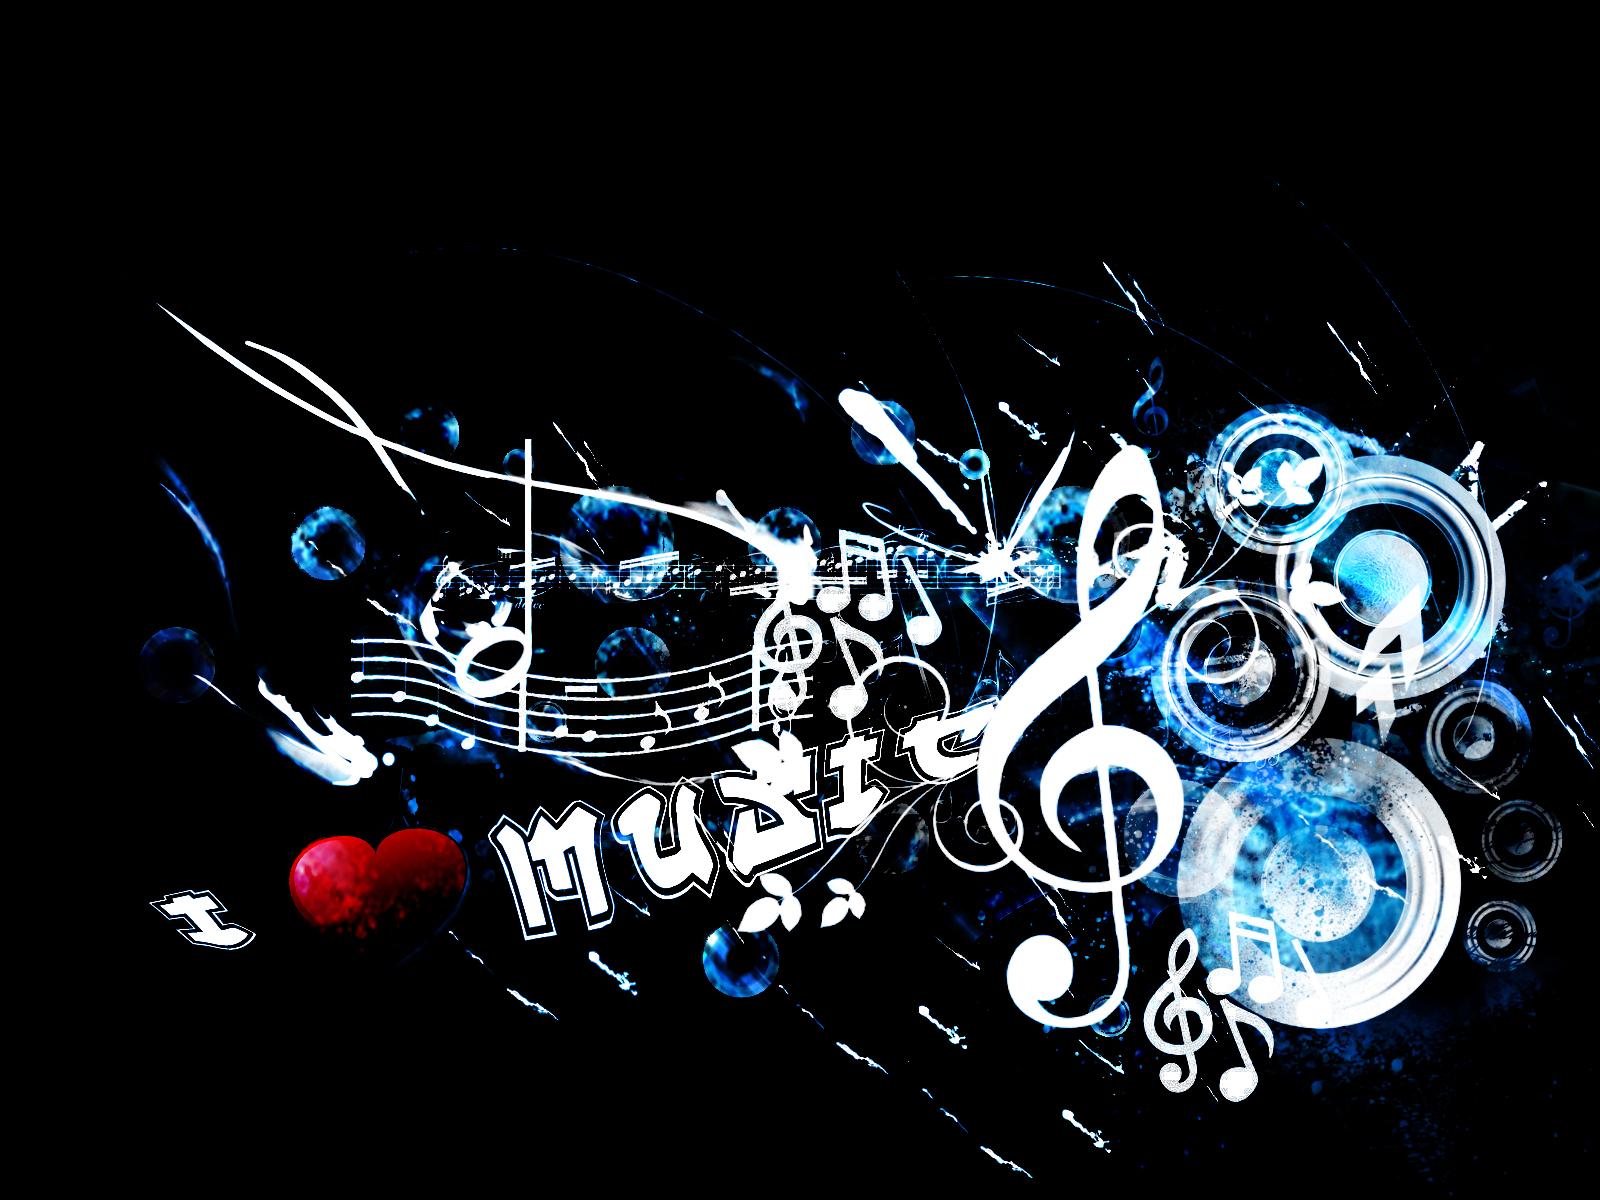 Music Wallpapers Music Hd Wallpapers Hd Music Screensavers 1600x1200